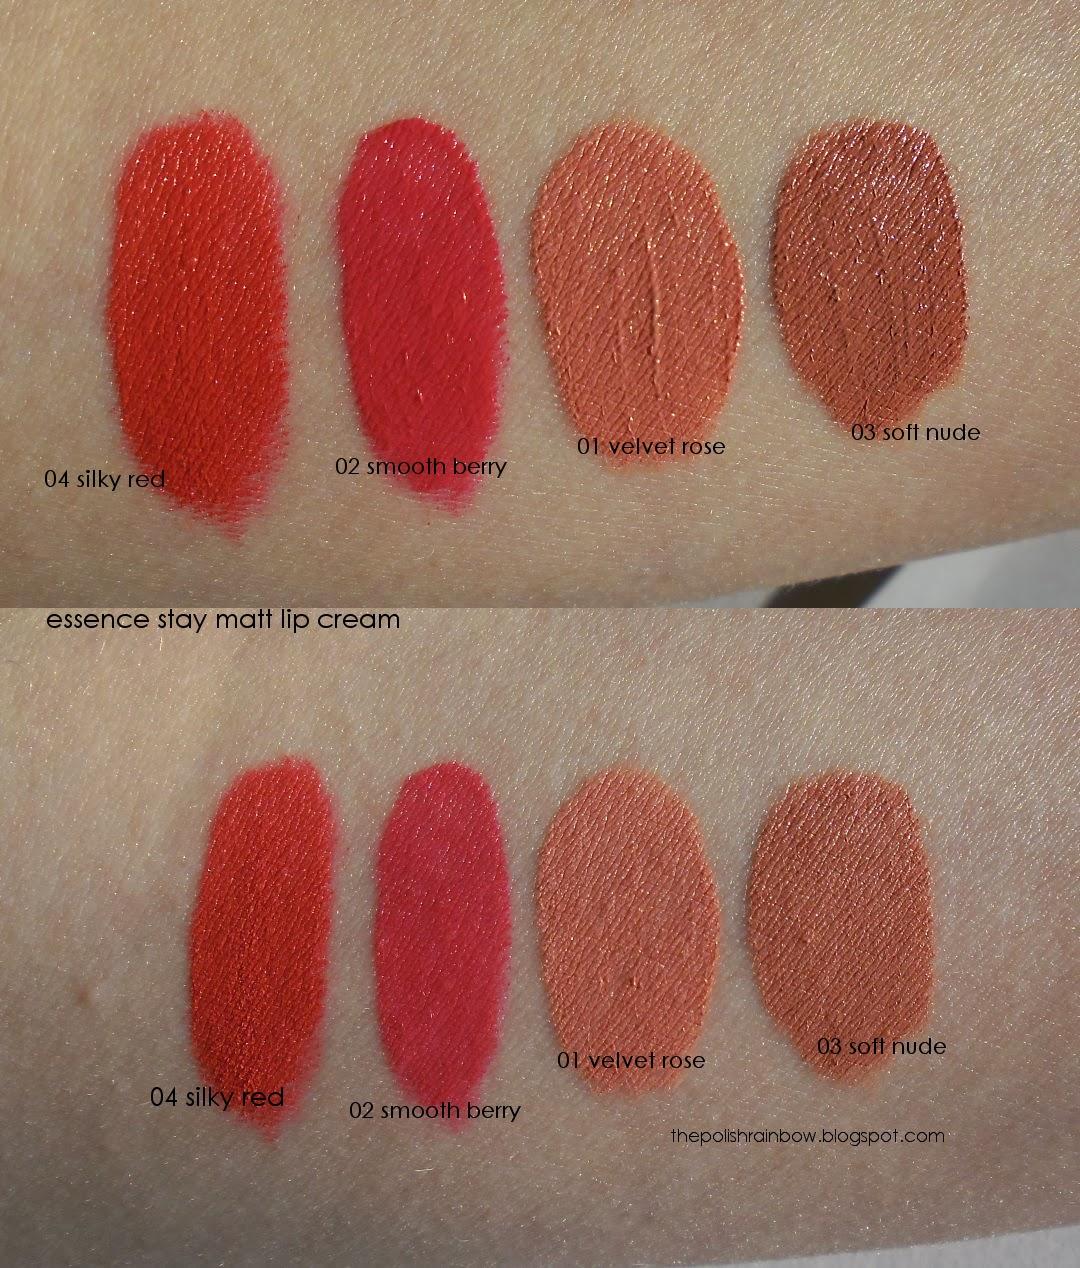 My Only 1 Lipstick Palette by essence #17